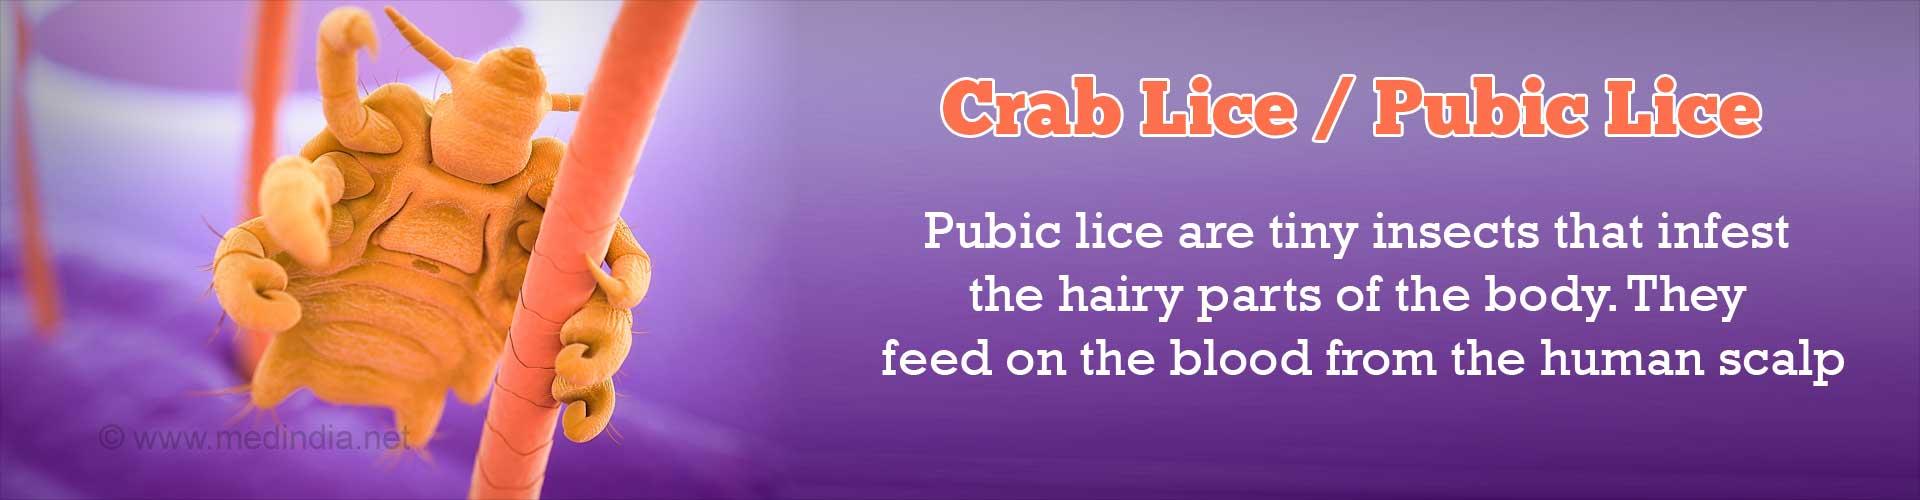 Crab Lice / Pubic Lice / Pediculosis